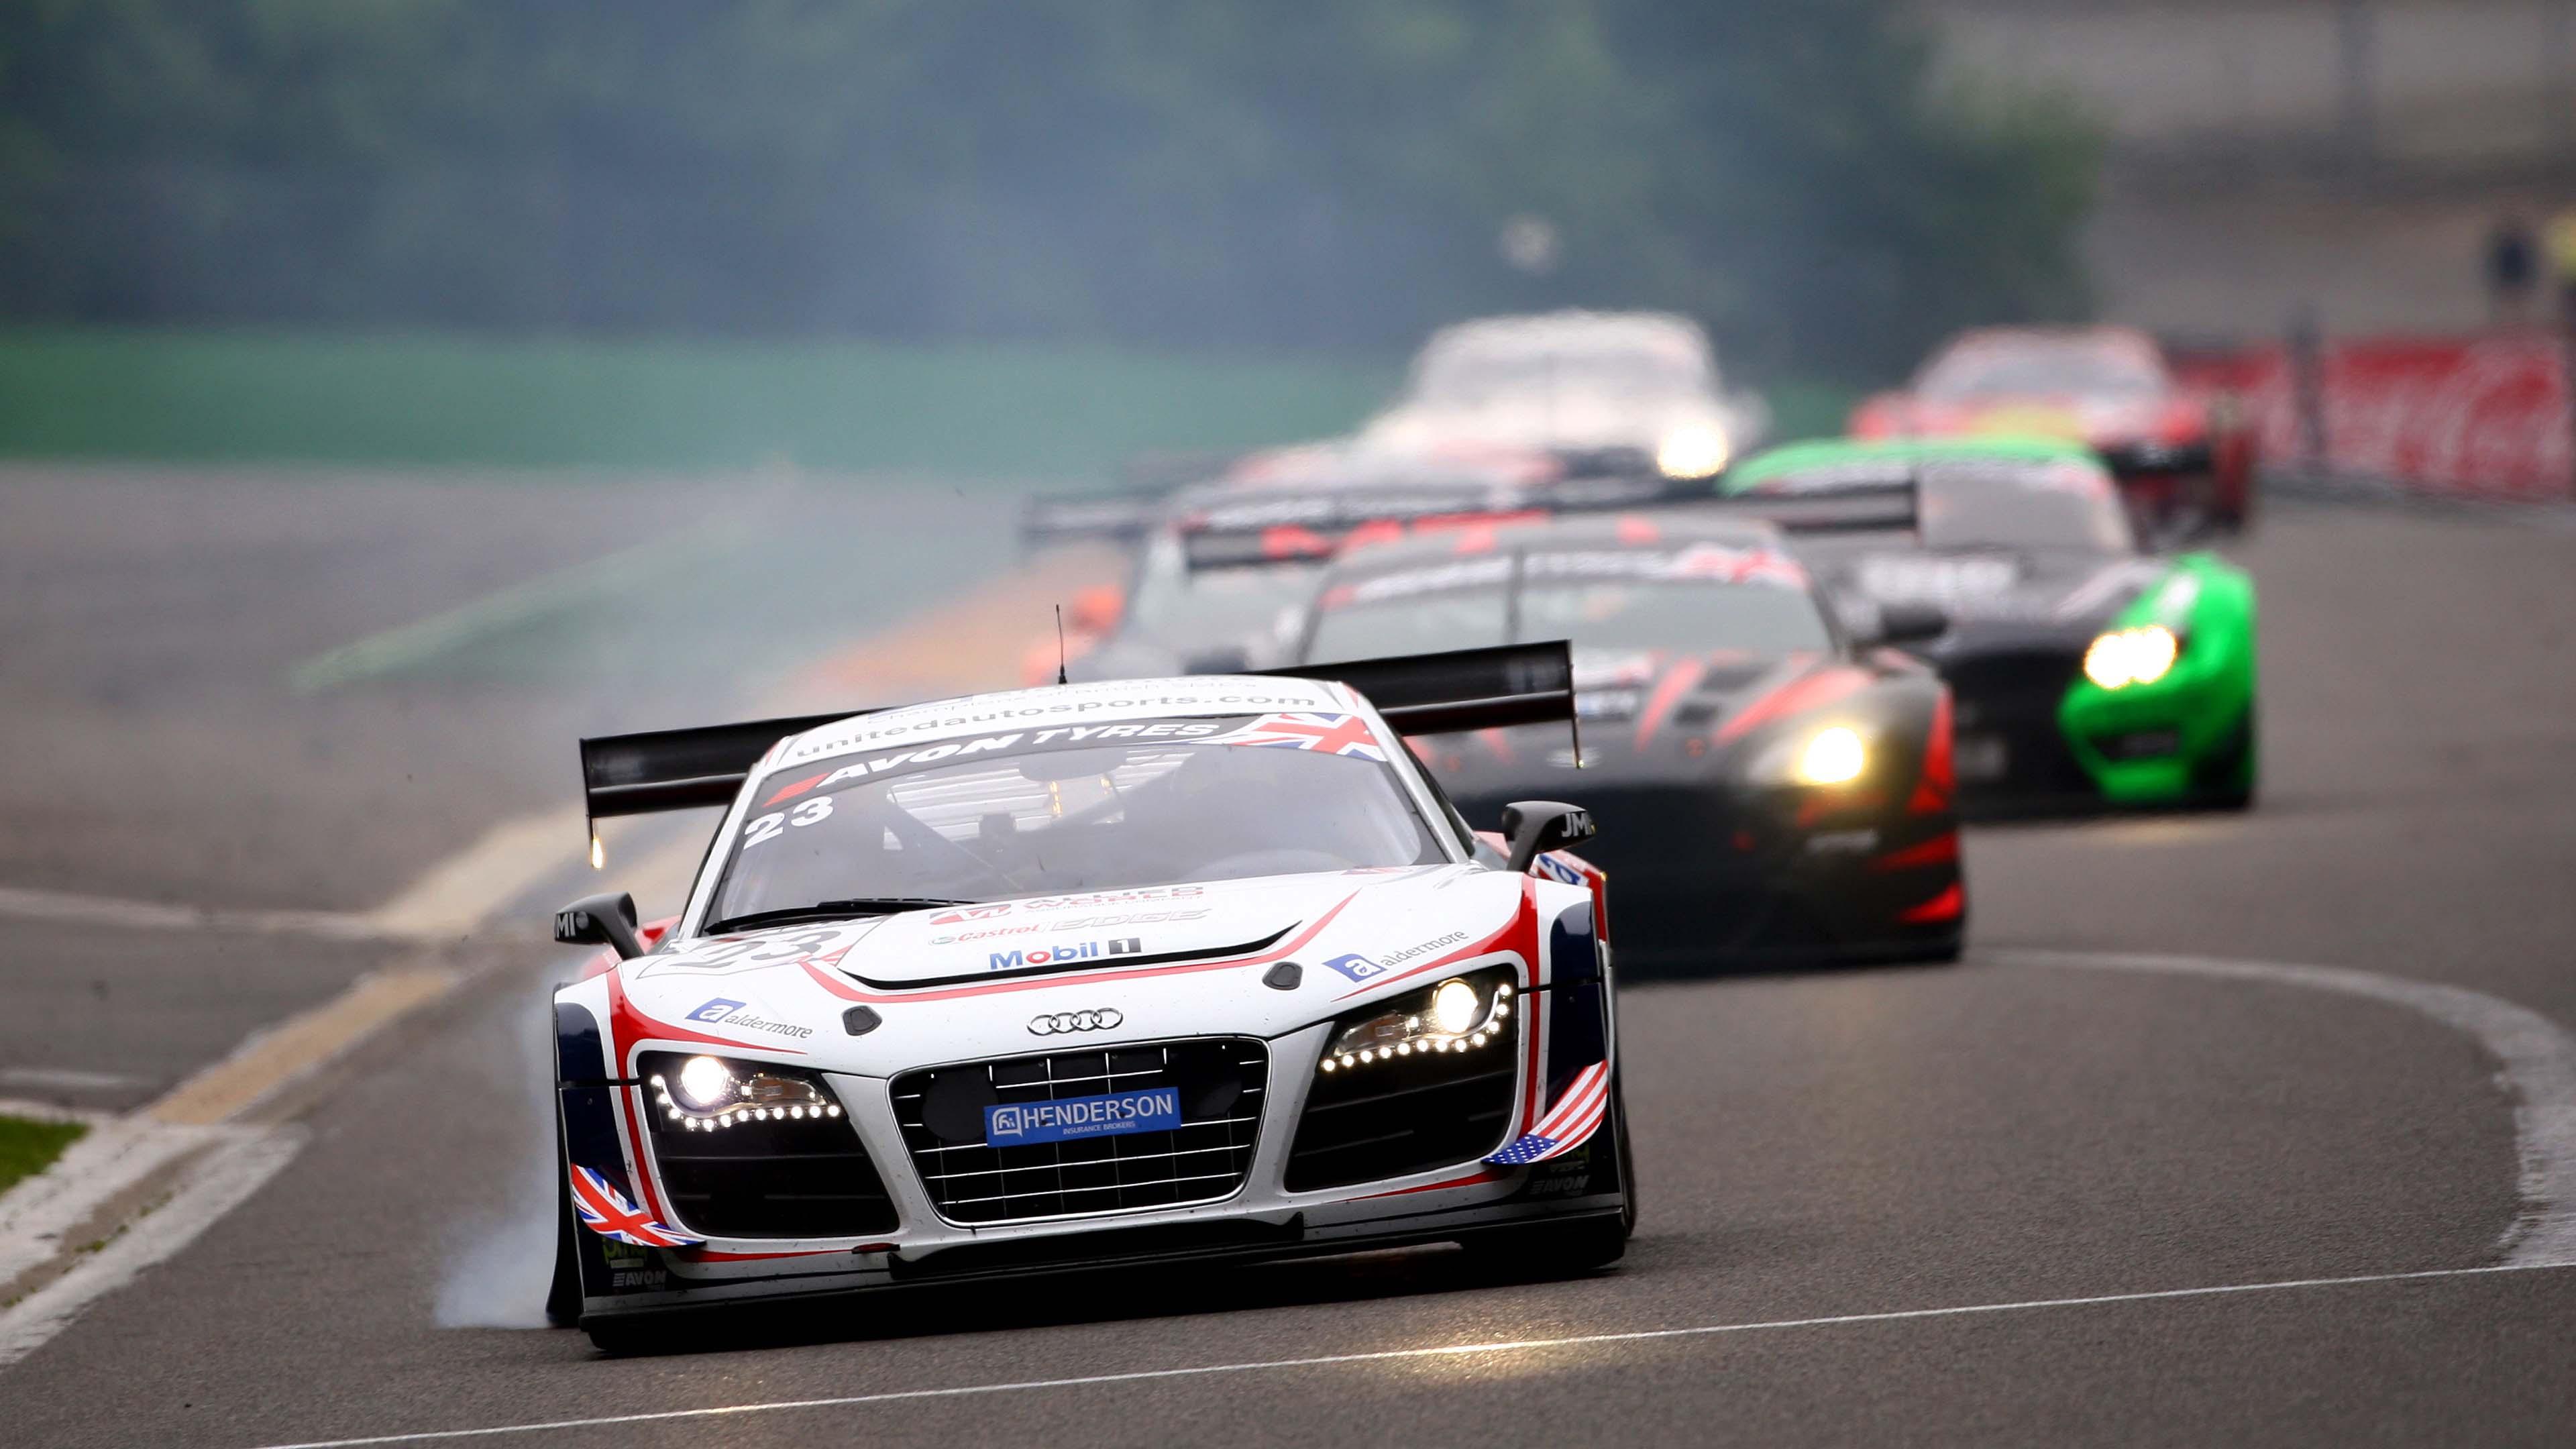 download Audi racing cars uhd wallpapers Ultra High 3840x2160